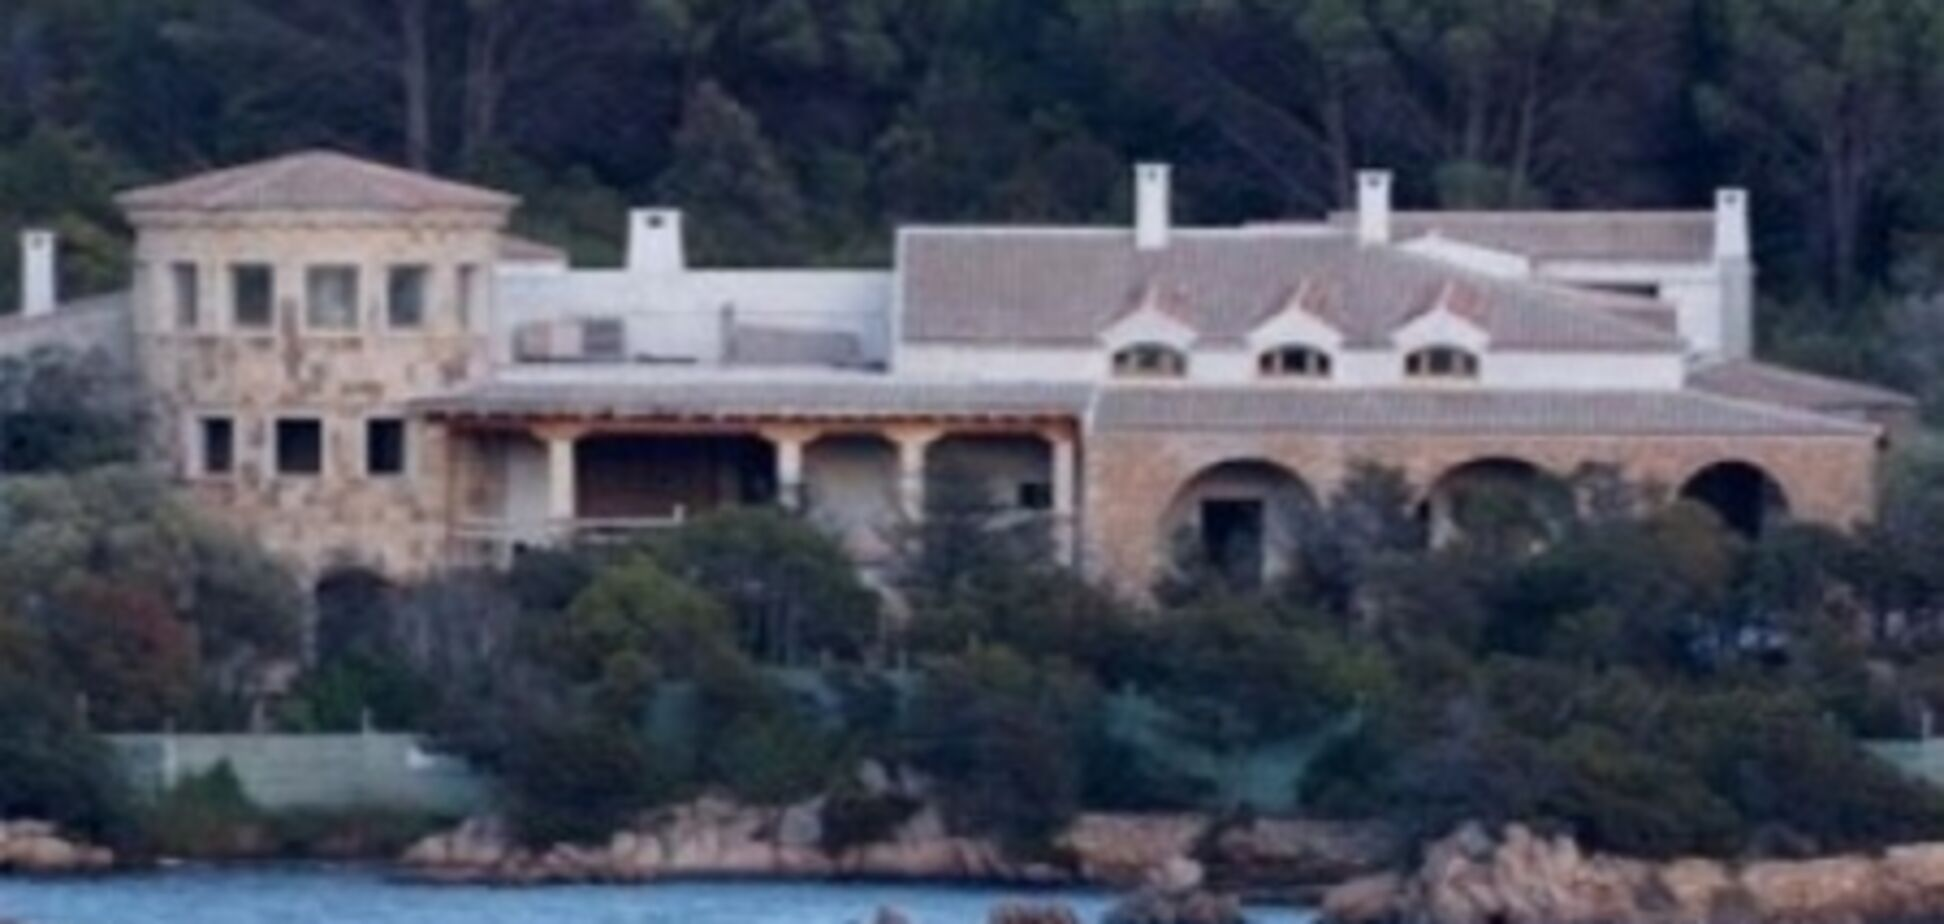 Неразбериха с арестованной виллой Абрамовича на Сардинии прояснилась